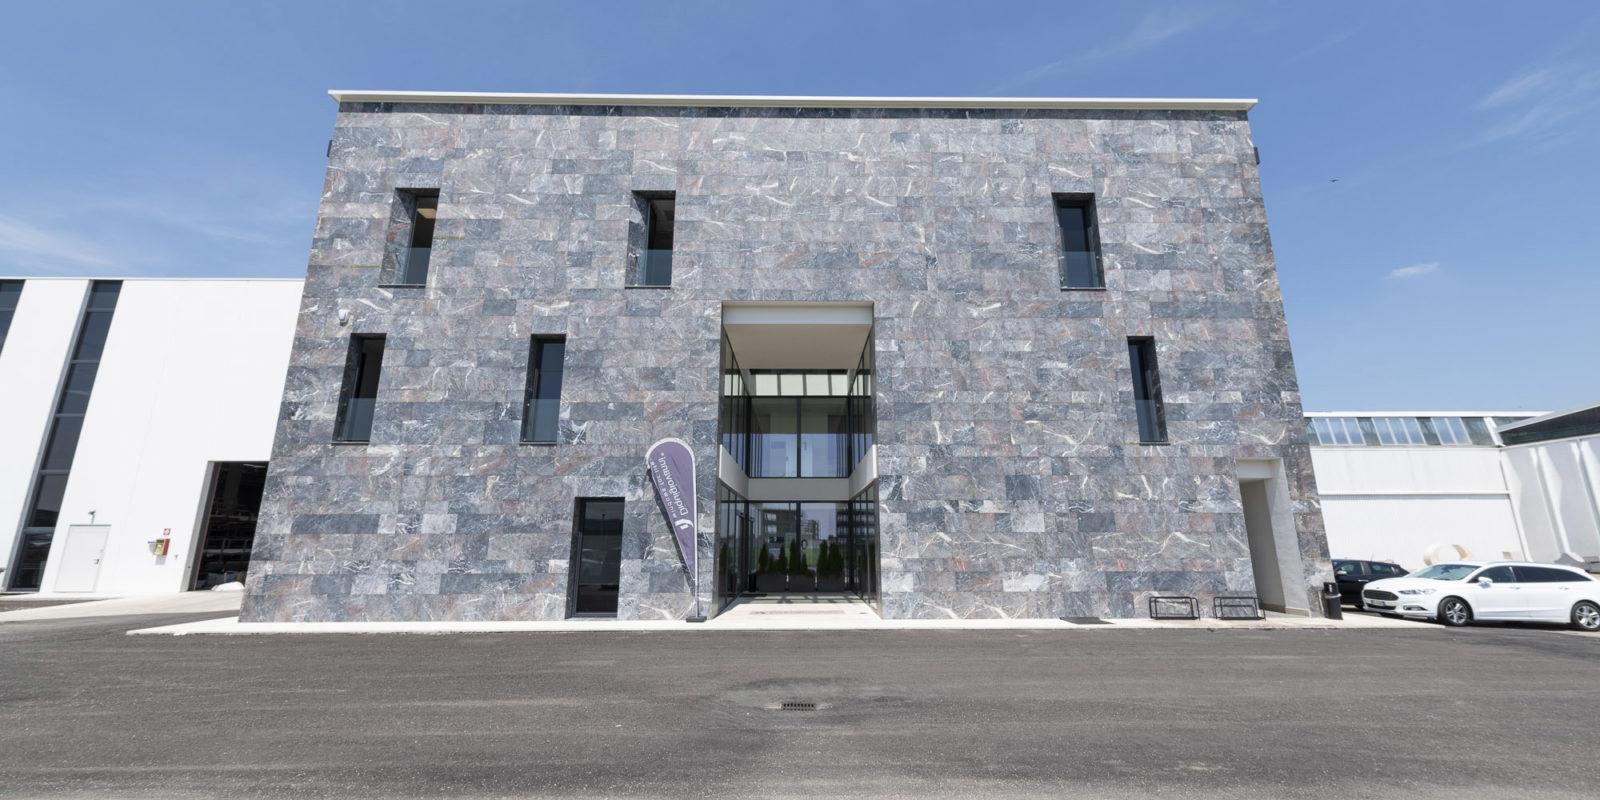 MARGRAF Spa – Industria Marmi Vicentini – Gambellara VI